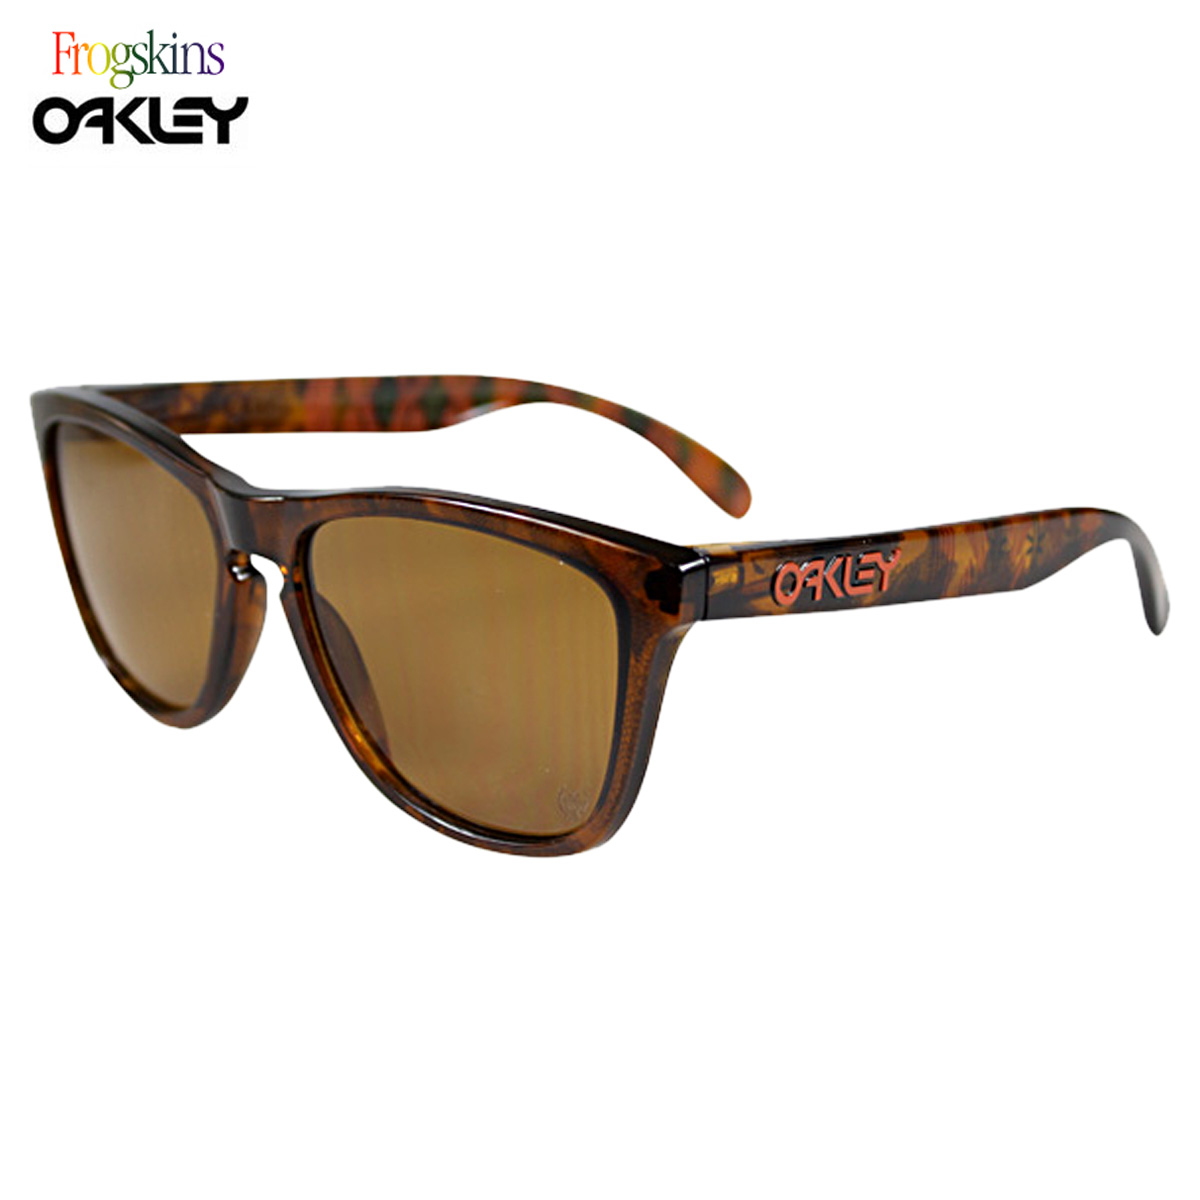 2527213de4  SOLD OUT  Oakley Oakley Sunglasses Frogskins frog skin mens Womens glasses  24-336 KAZ Braun × tortoiseshell x bronze KAZU KOKUBO SIGNATURE SERIES  unisex ...